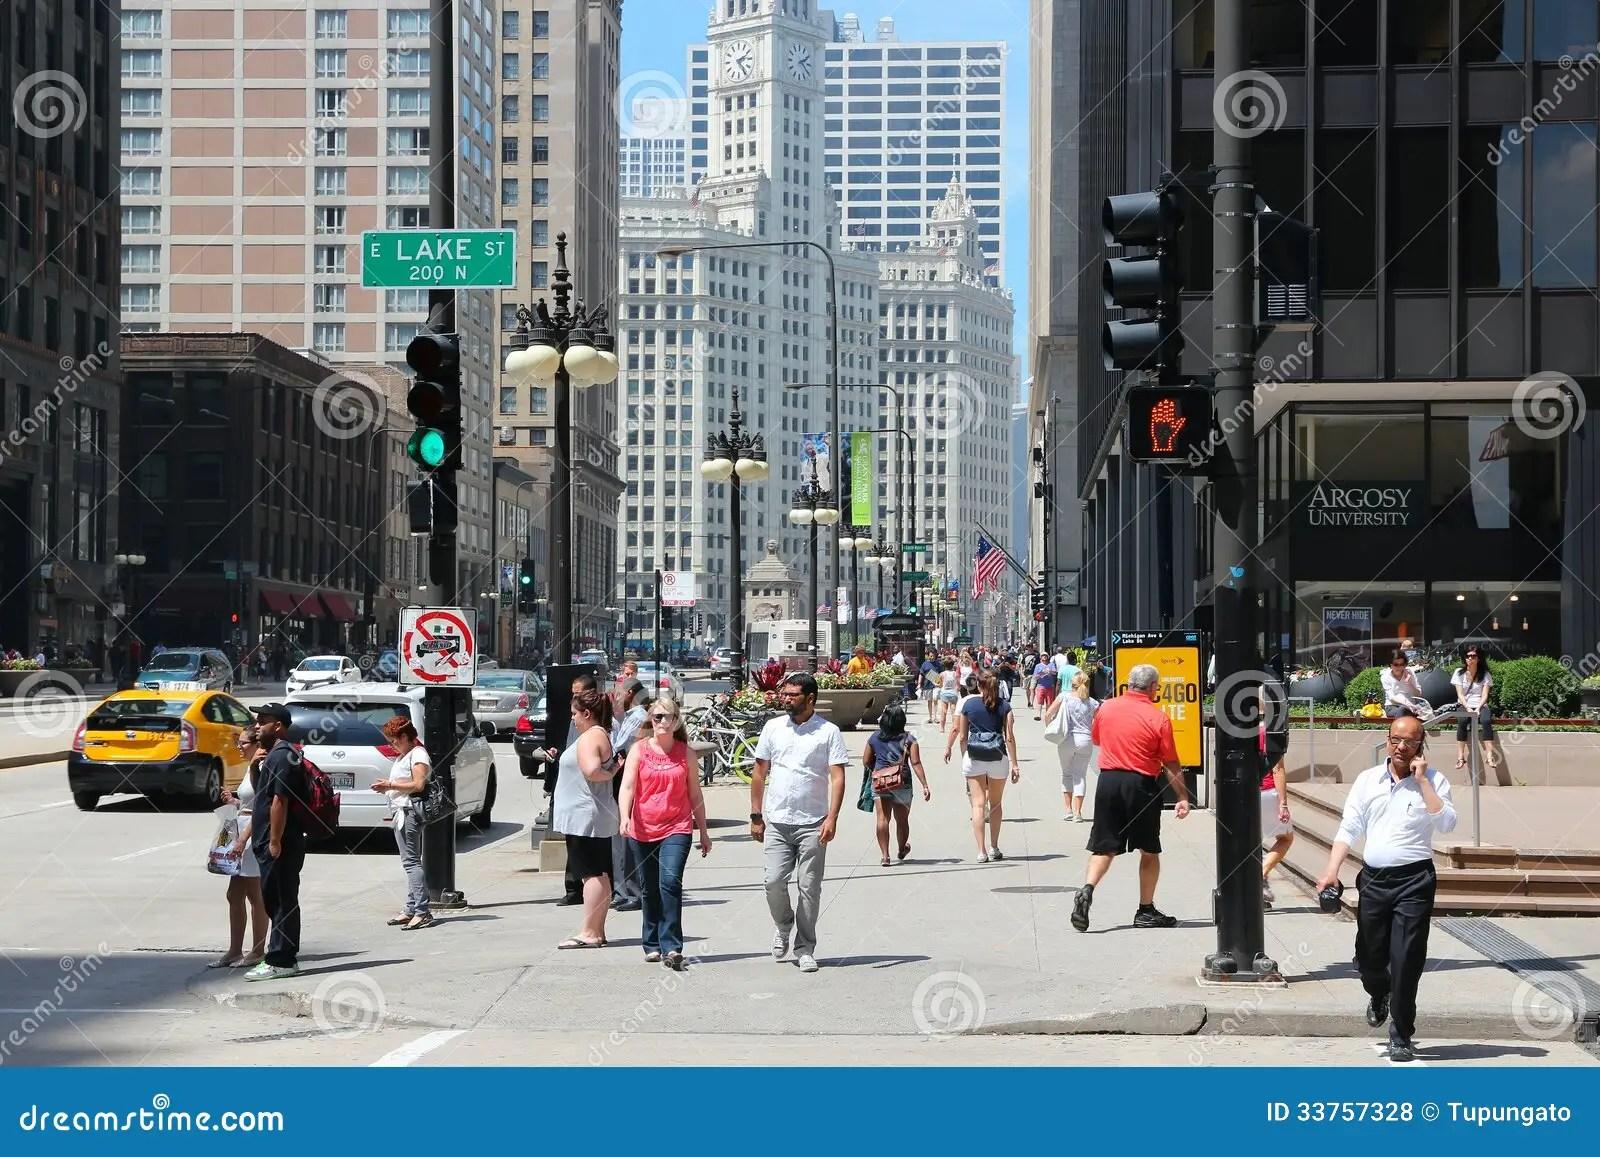 Chicago Michigan Avenue Editorial Stock Photo Image